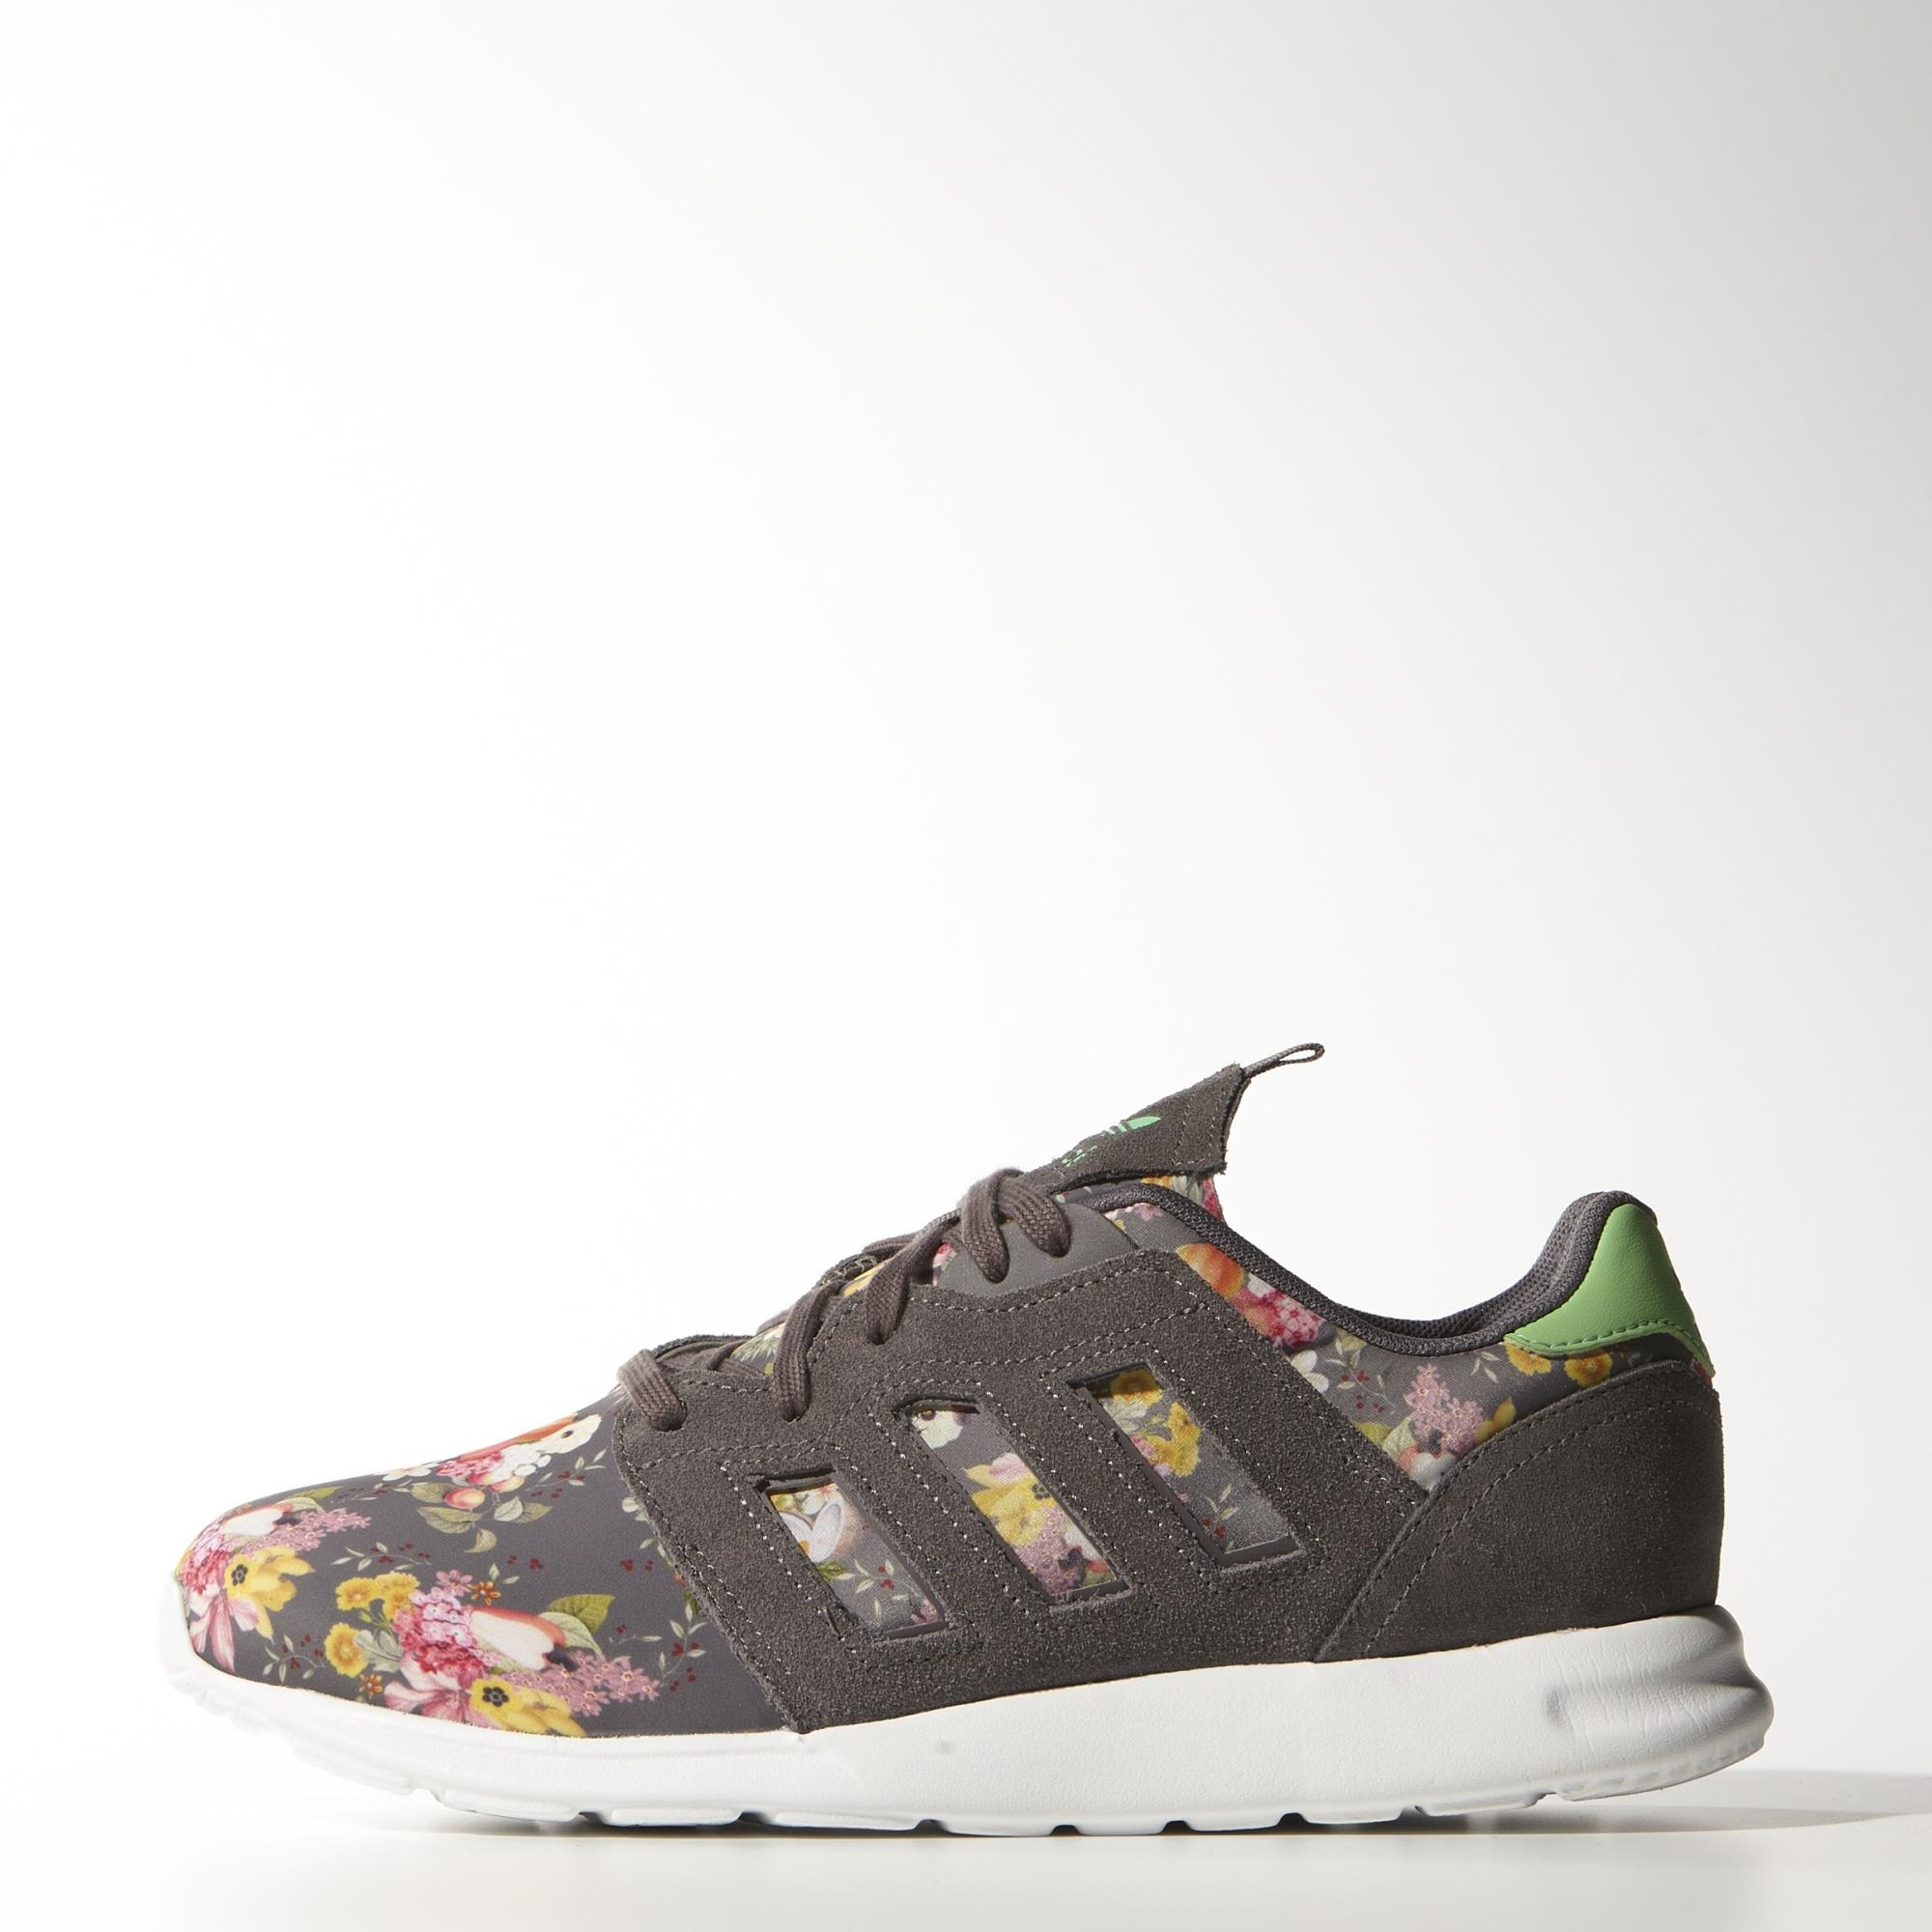 Chaussure zx 500 2.0 adidas